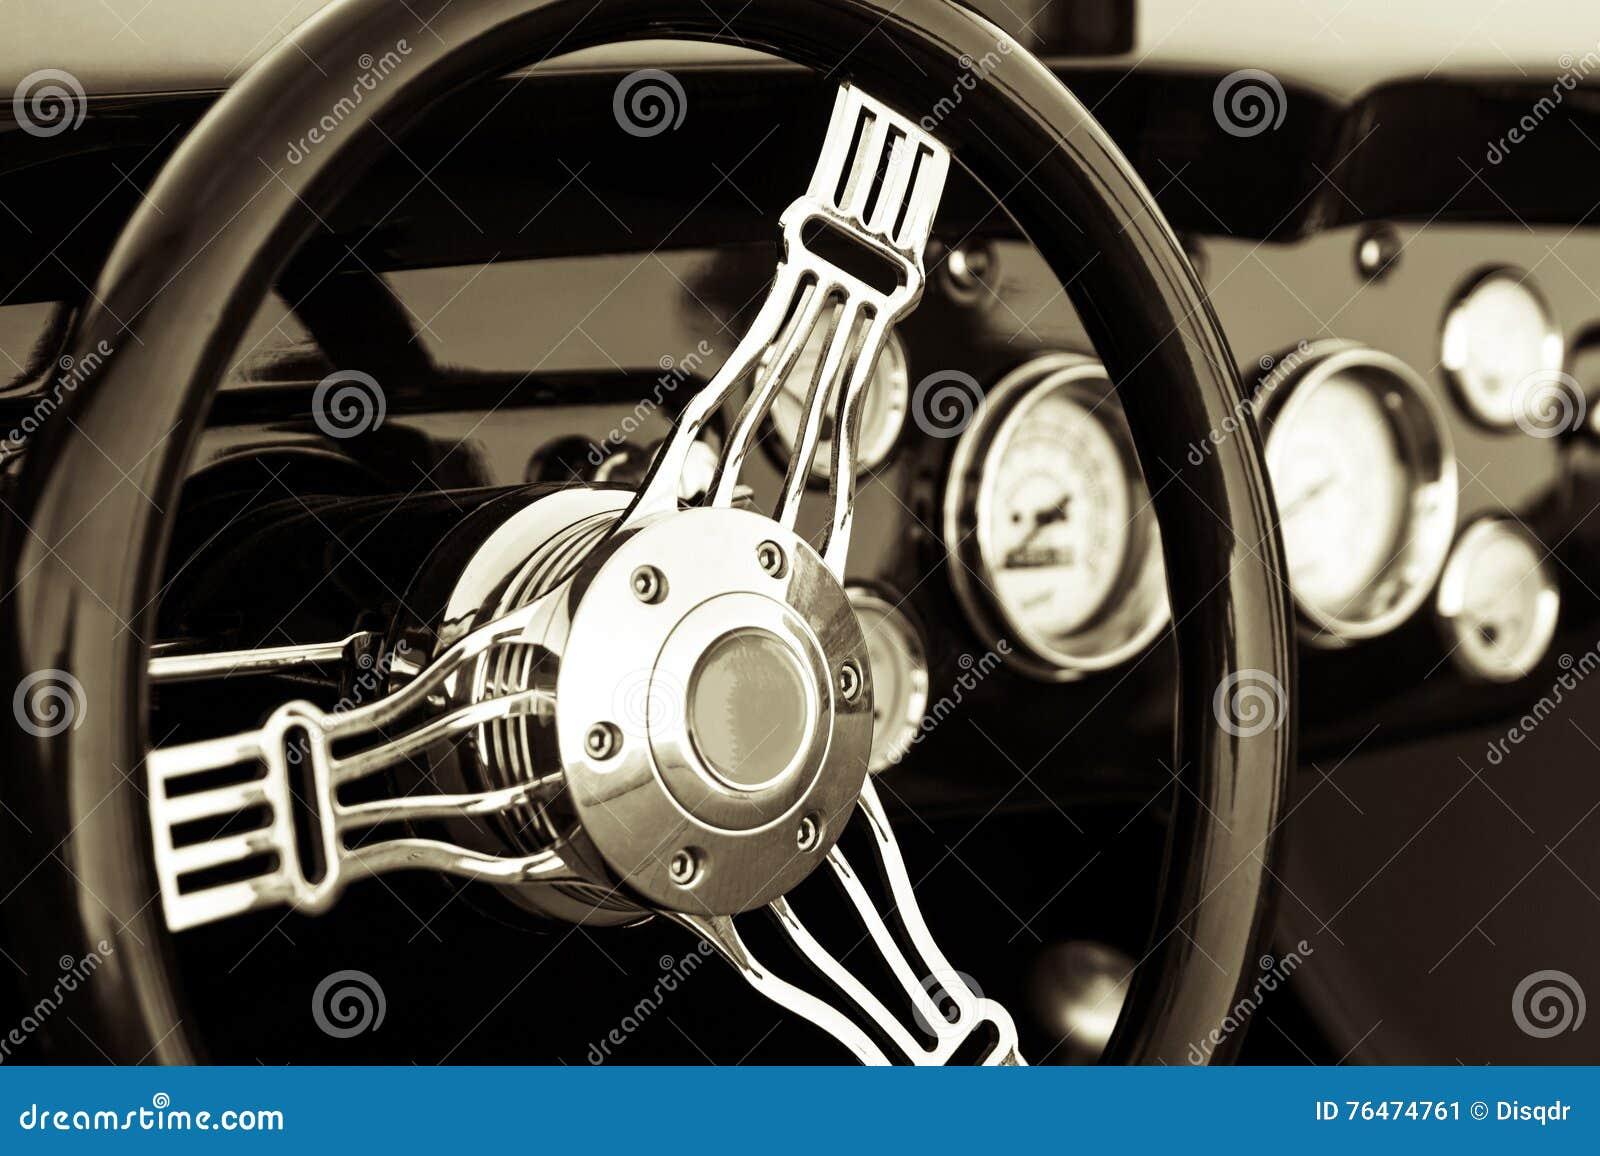 Old Car Dashboard Stock Image Image Of Interior Design 76474761